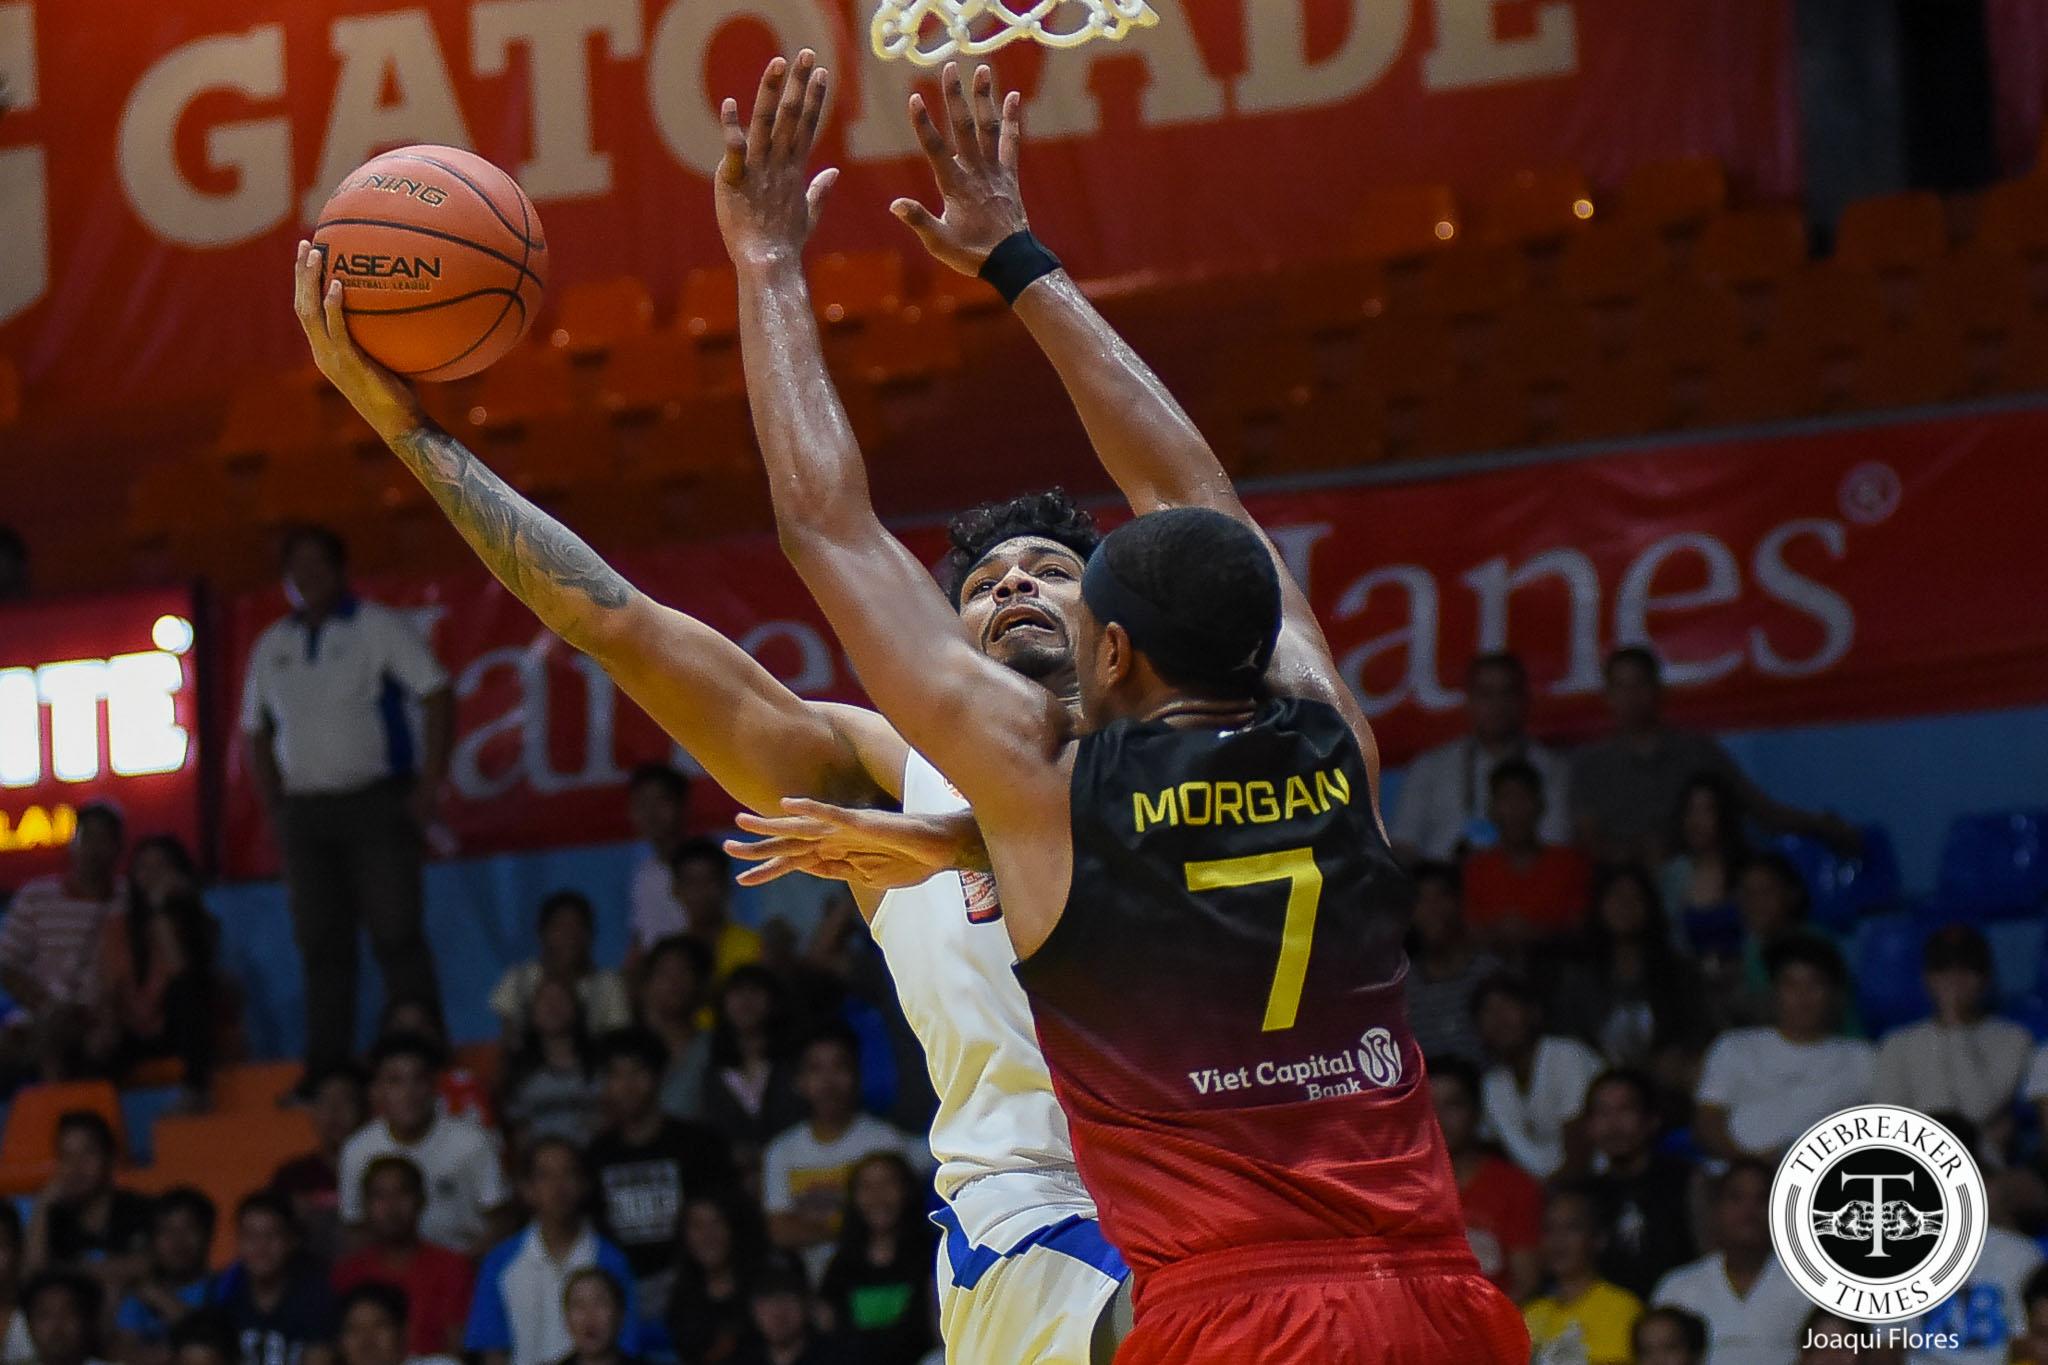 ABL-8-QF-Alab-vs.-Saigon-Domingo-0581 Things get physical between Alab and Saigon ABL Alab Pilipinas Basketball News  - philippine sports news